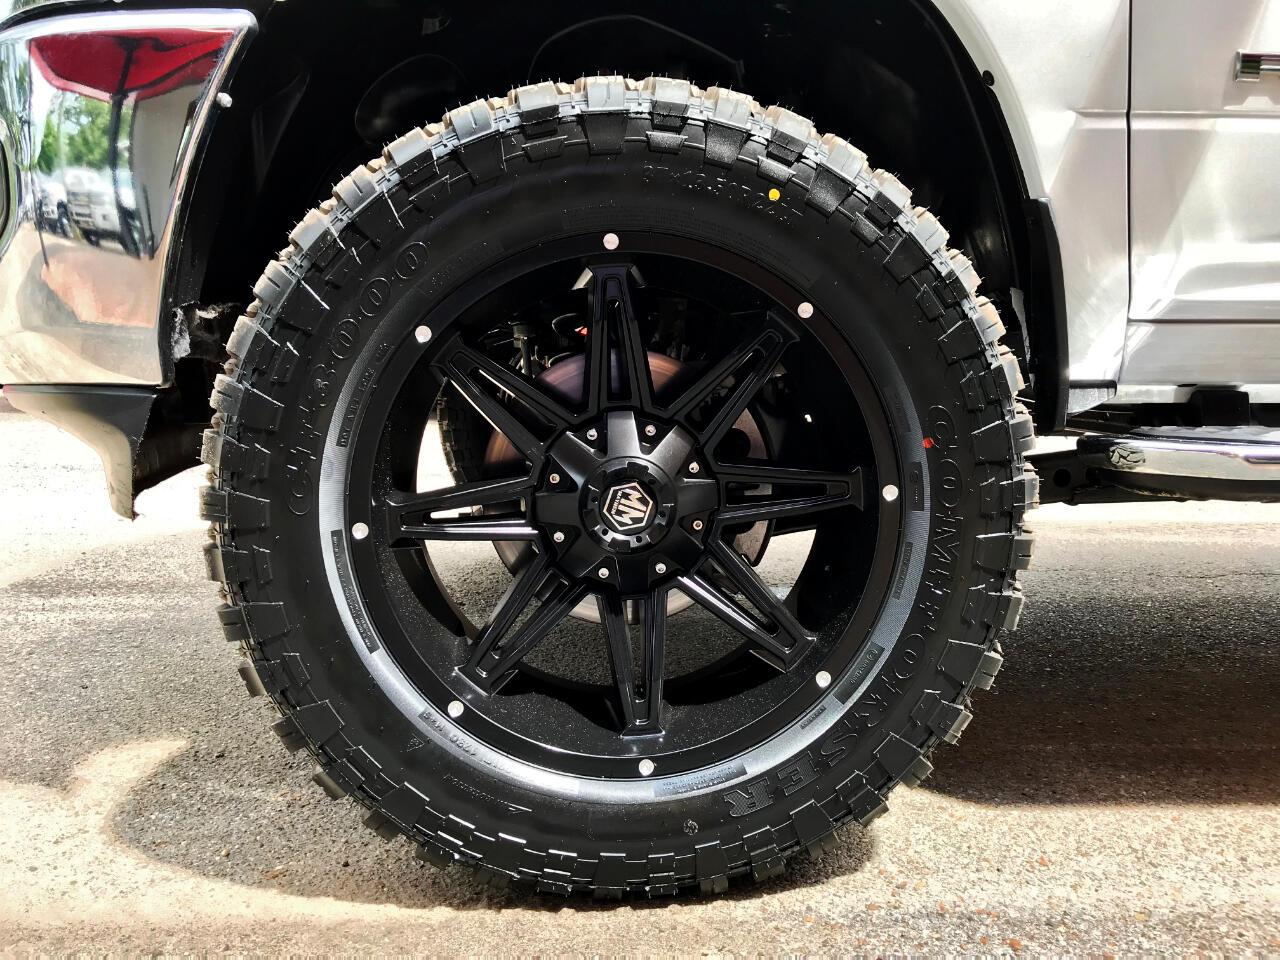 2019 RAM 2500 TRADESMAN CREW CAB SHORT BED 4WD CUSTOM LEVELED